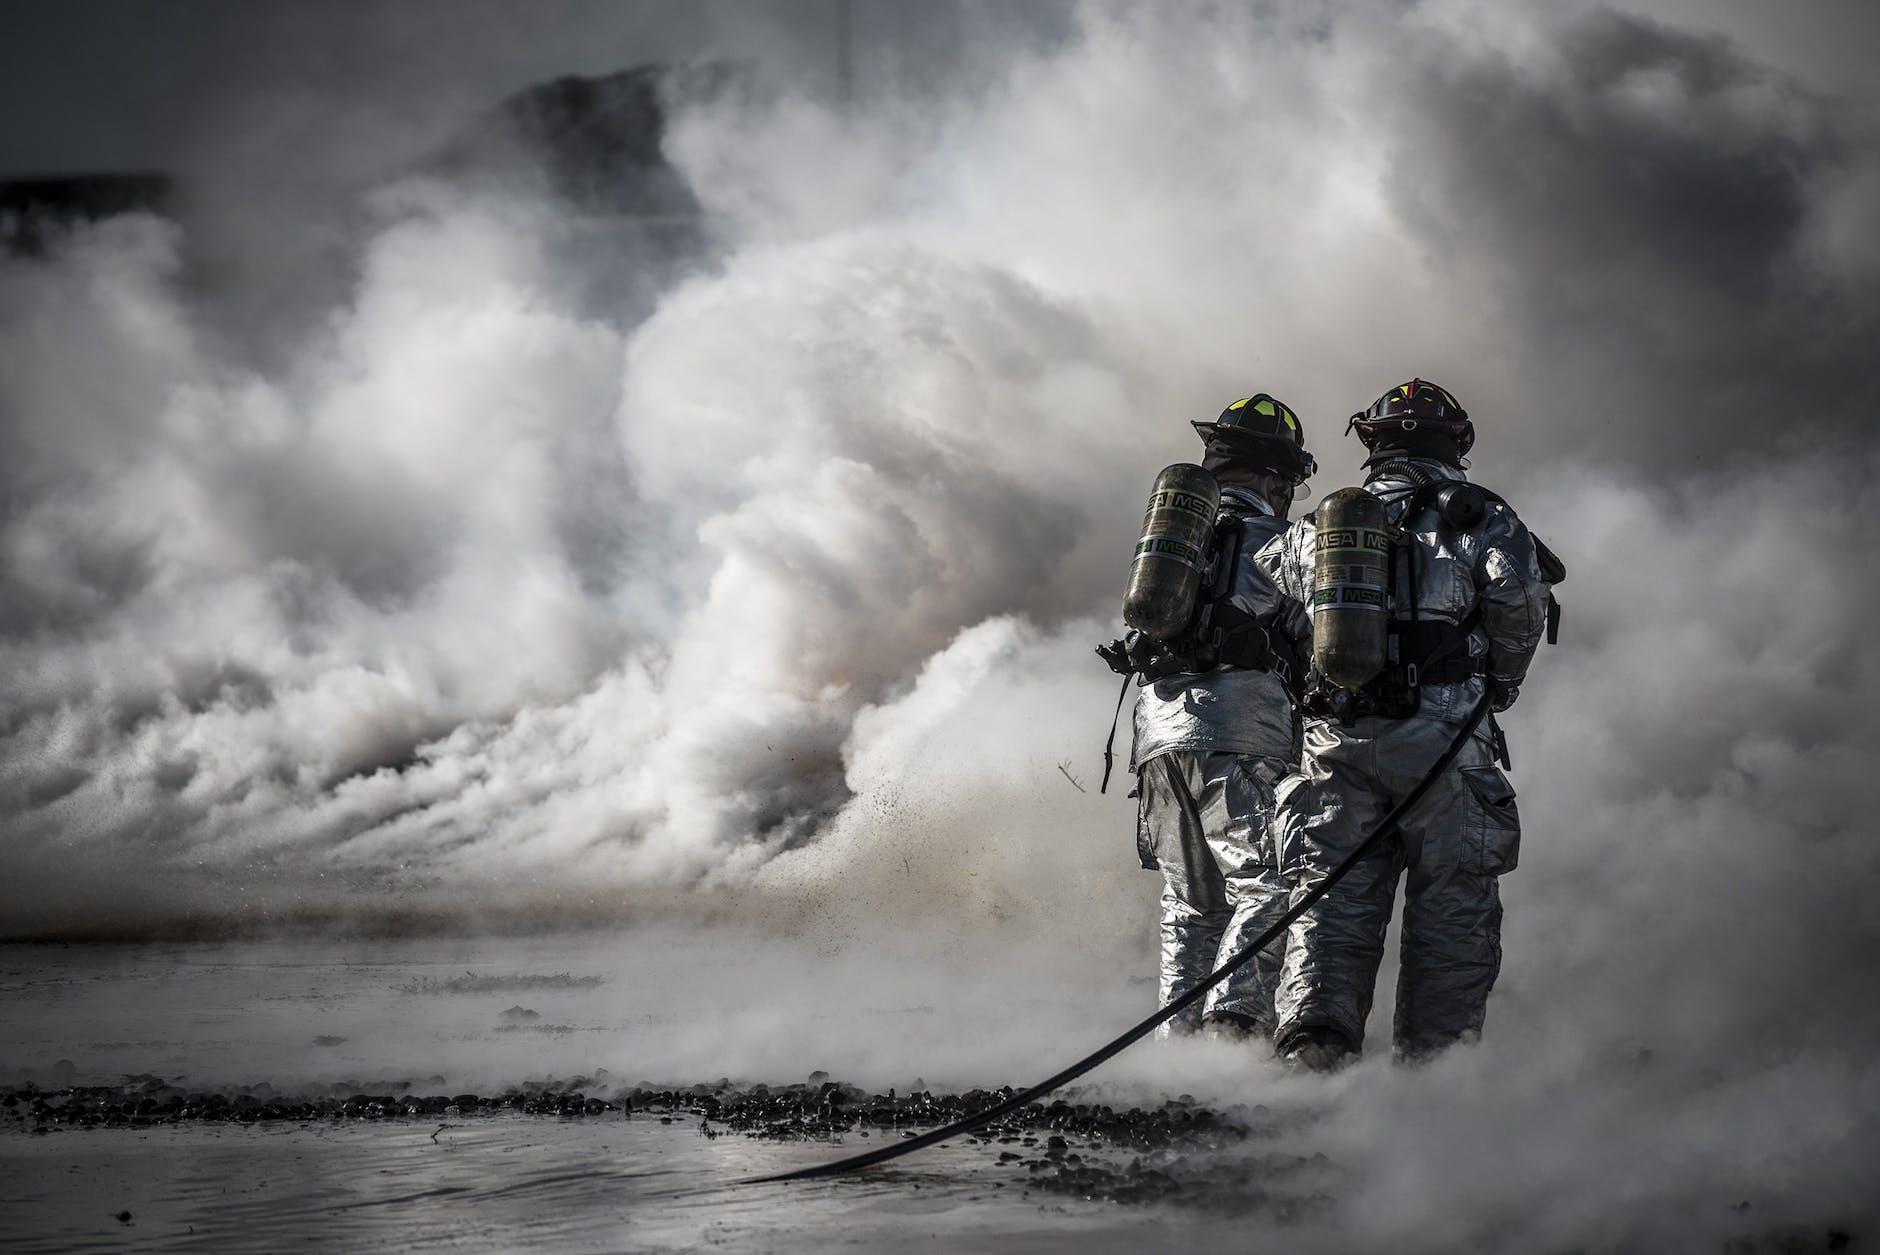 https://images.pexels.com/photos/37543/firefighters-training-live-fire-37543.jpeg?auto=compress&cs=tinysrgb&dpr=2&h=650&w=940